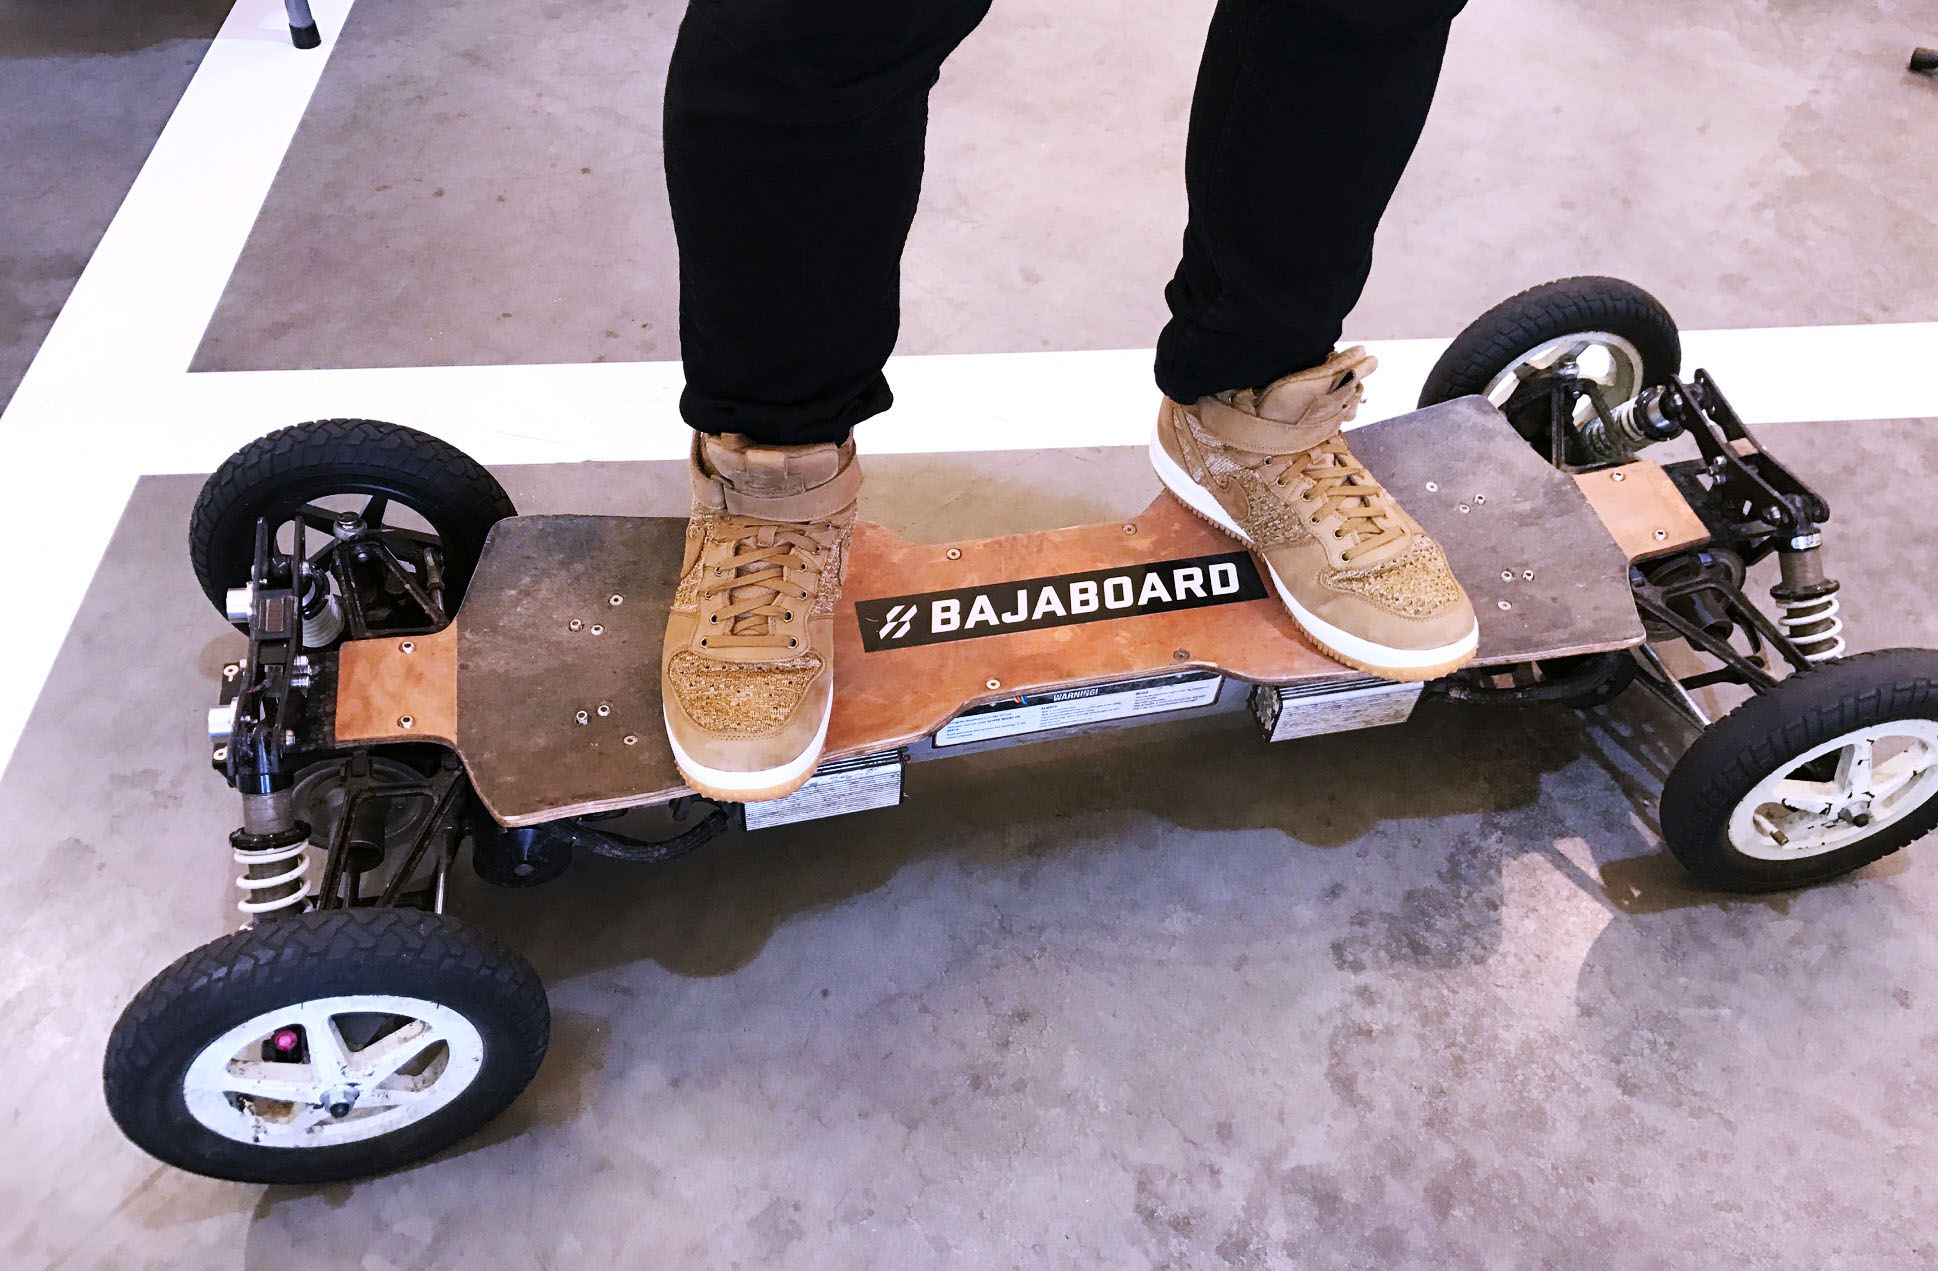 My rad kicks on a motorised skateboard. copy